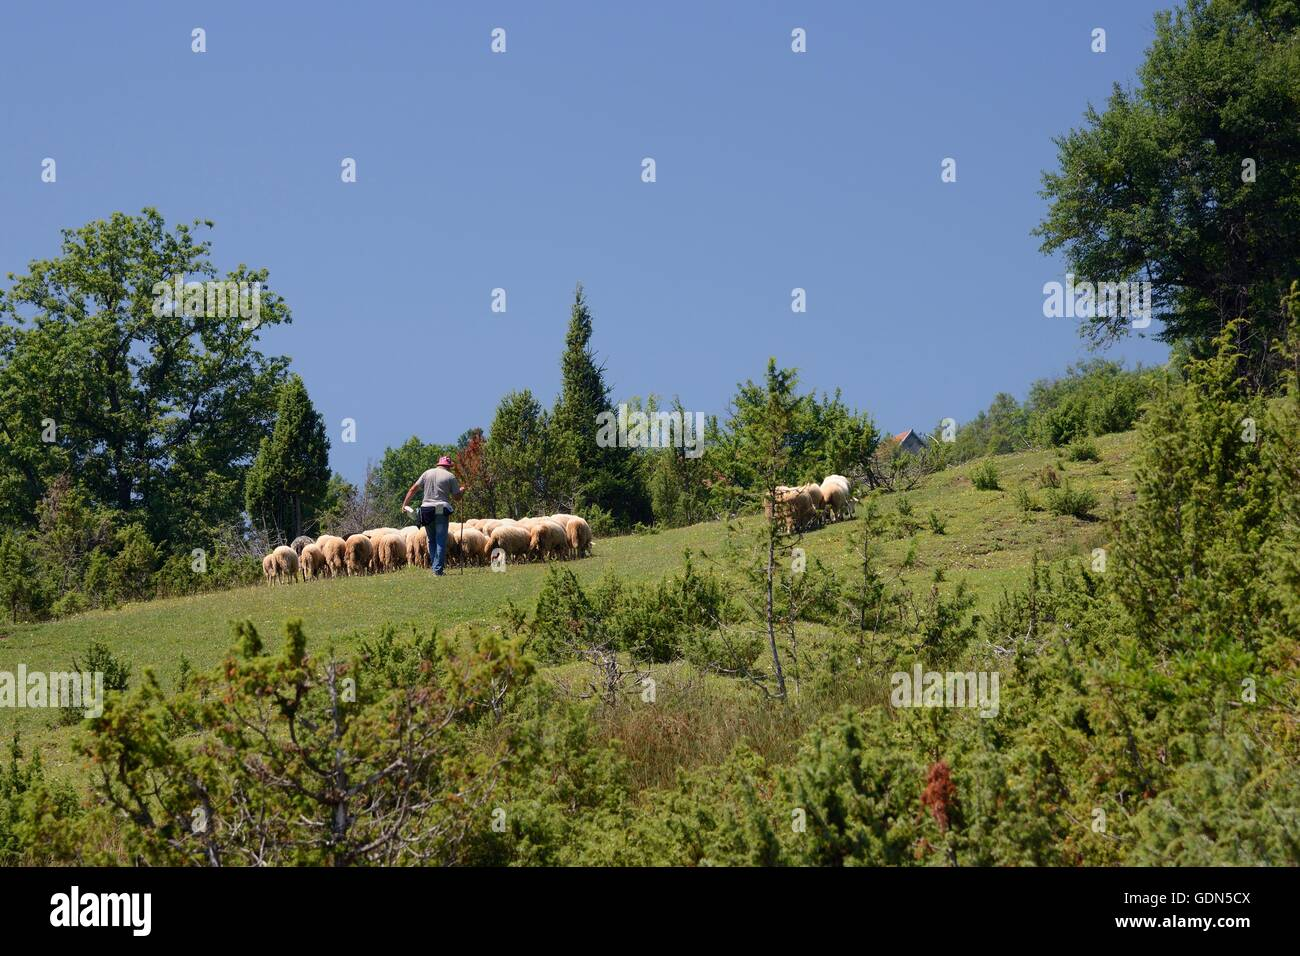 Sheep (Ovis aries) being herded in alpine pastureland, near Foca, Bosnia and Herzegovina, July. - Stock Image